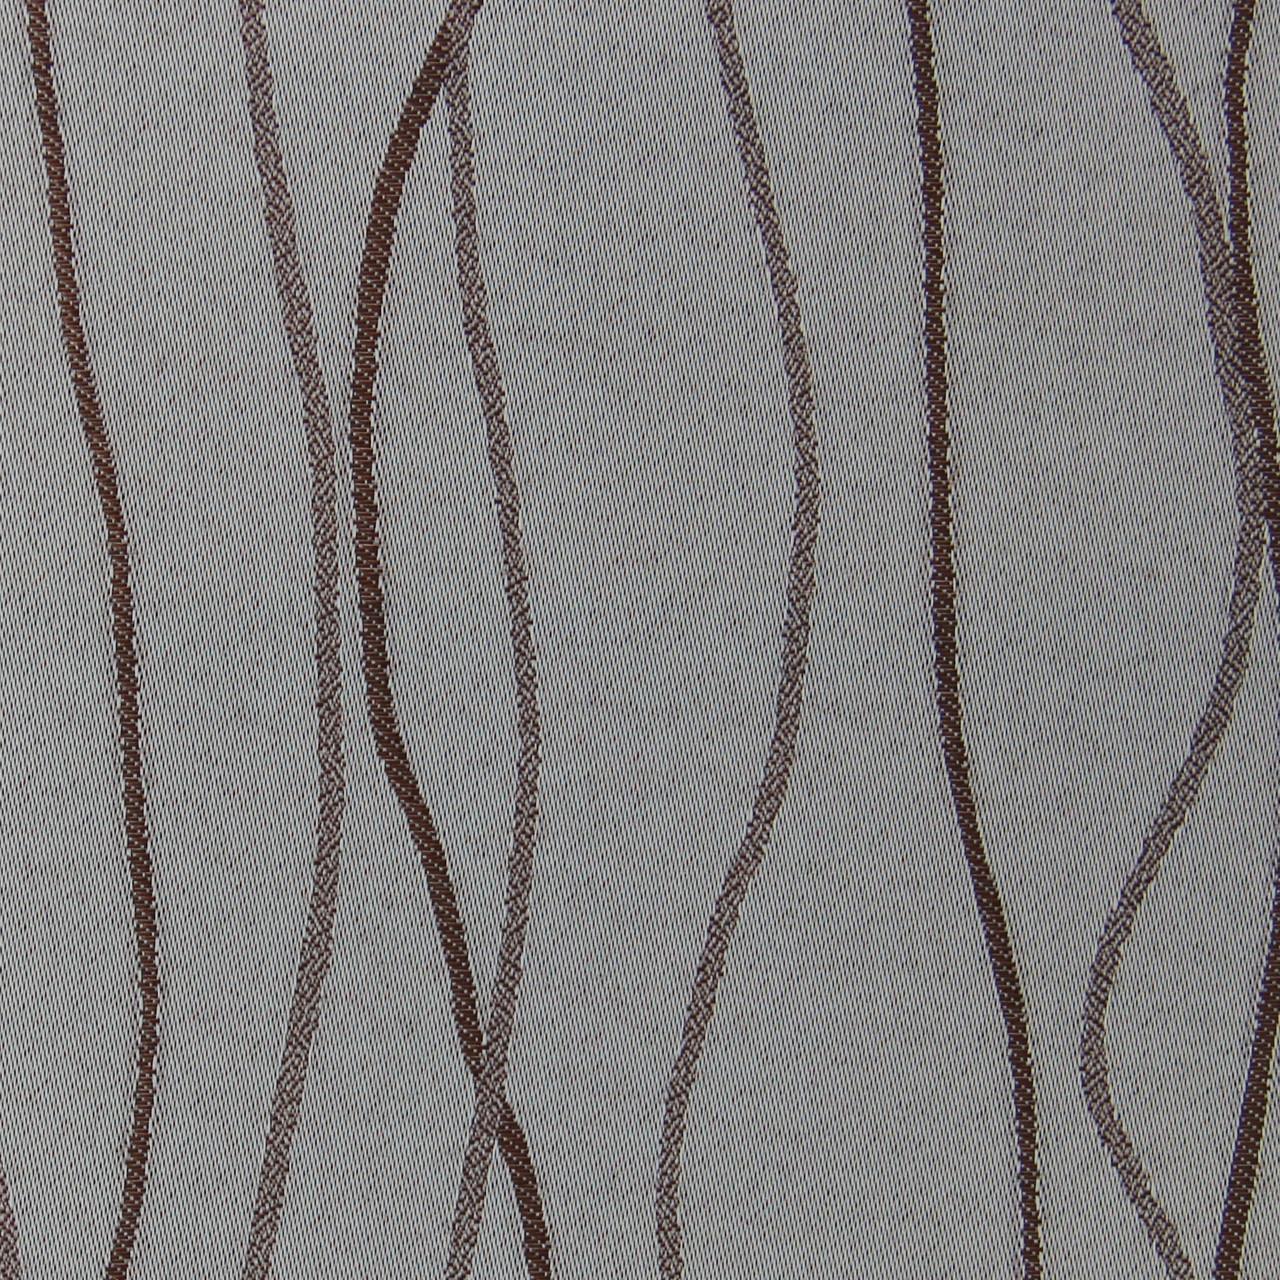 Рулонные шторы Ткань Фала 2280 Орех